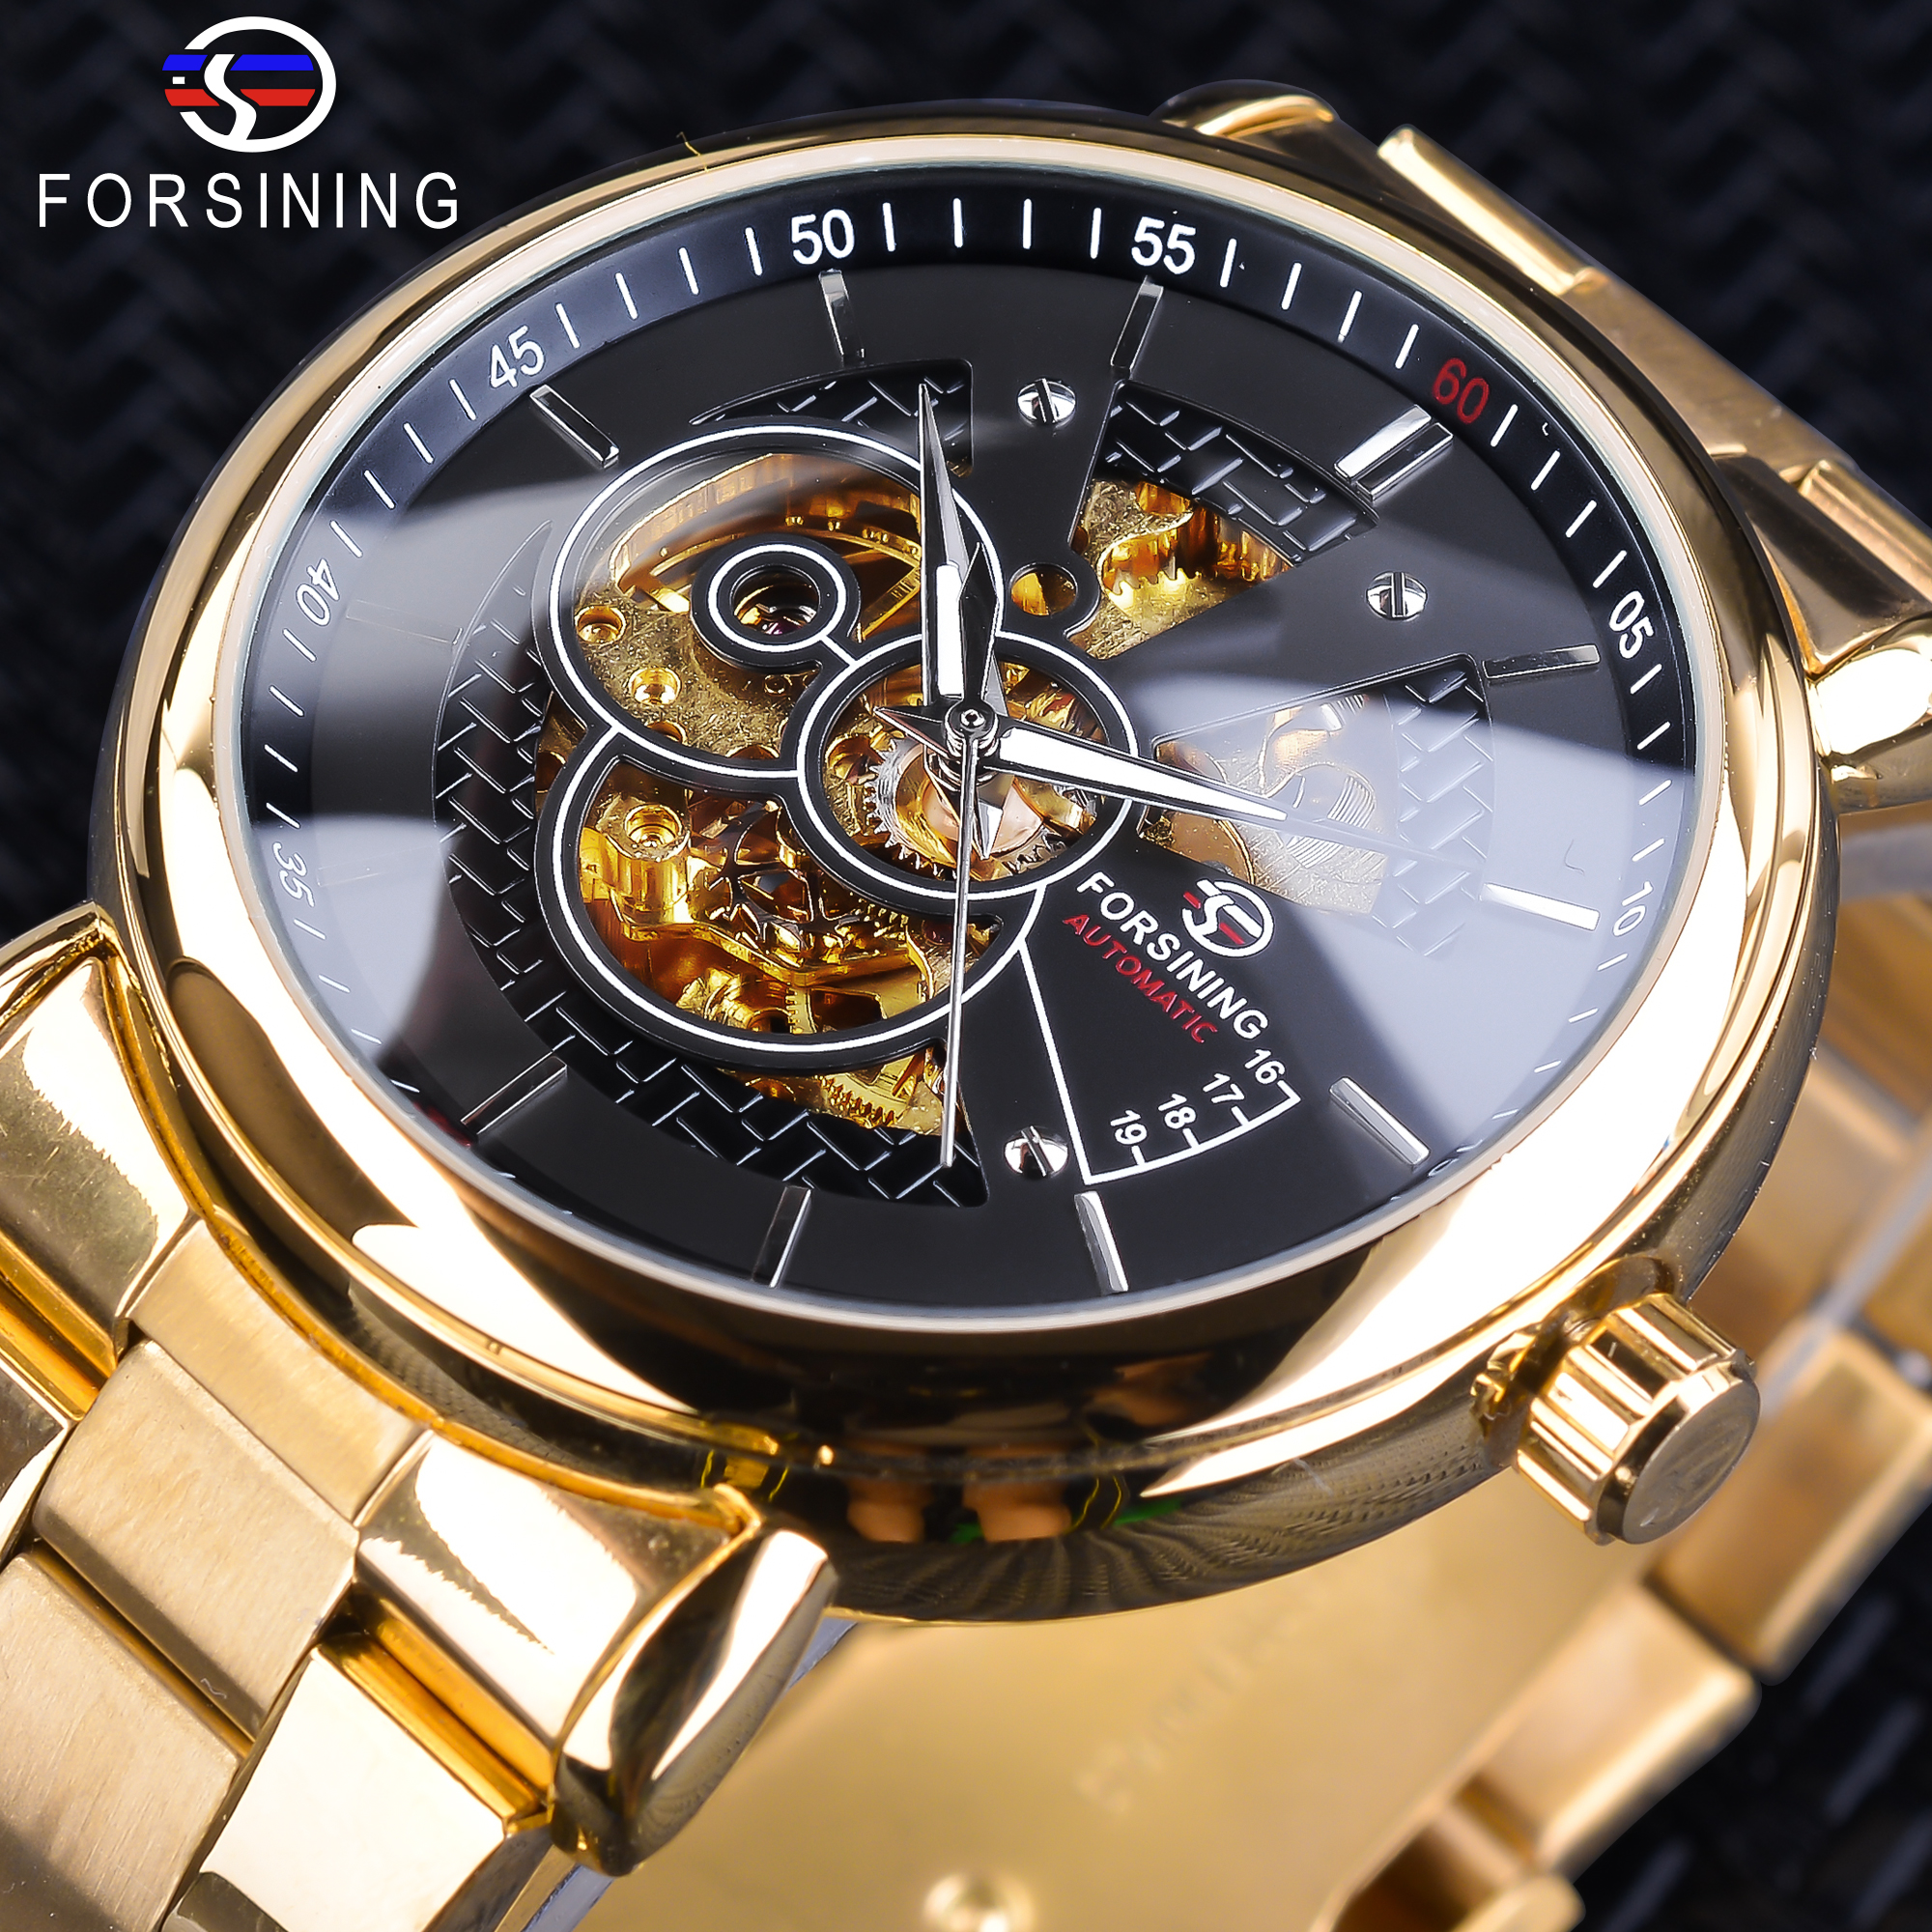 Forsining New Black Golden Openwork Clock Luminous Hands Design Gold Stainless Steel Men's Automatic Watches Top Brand Luxury